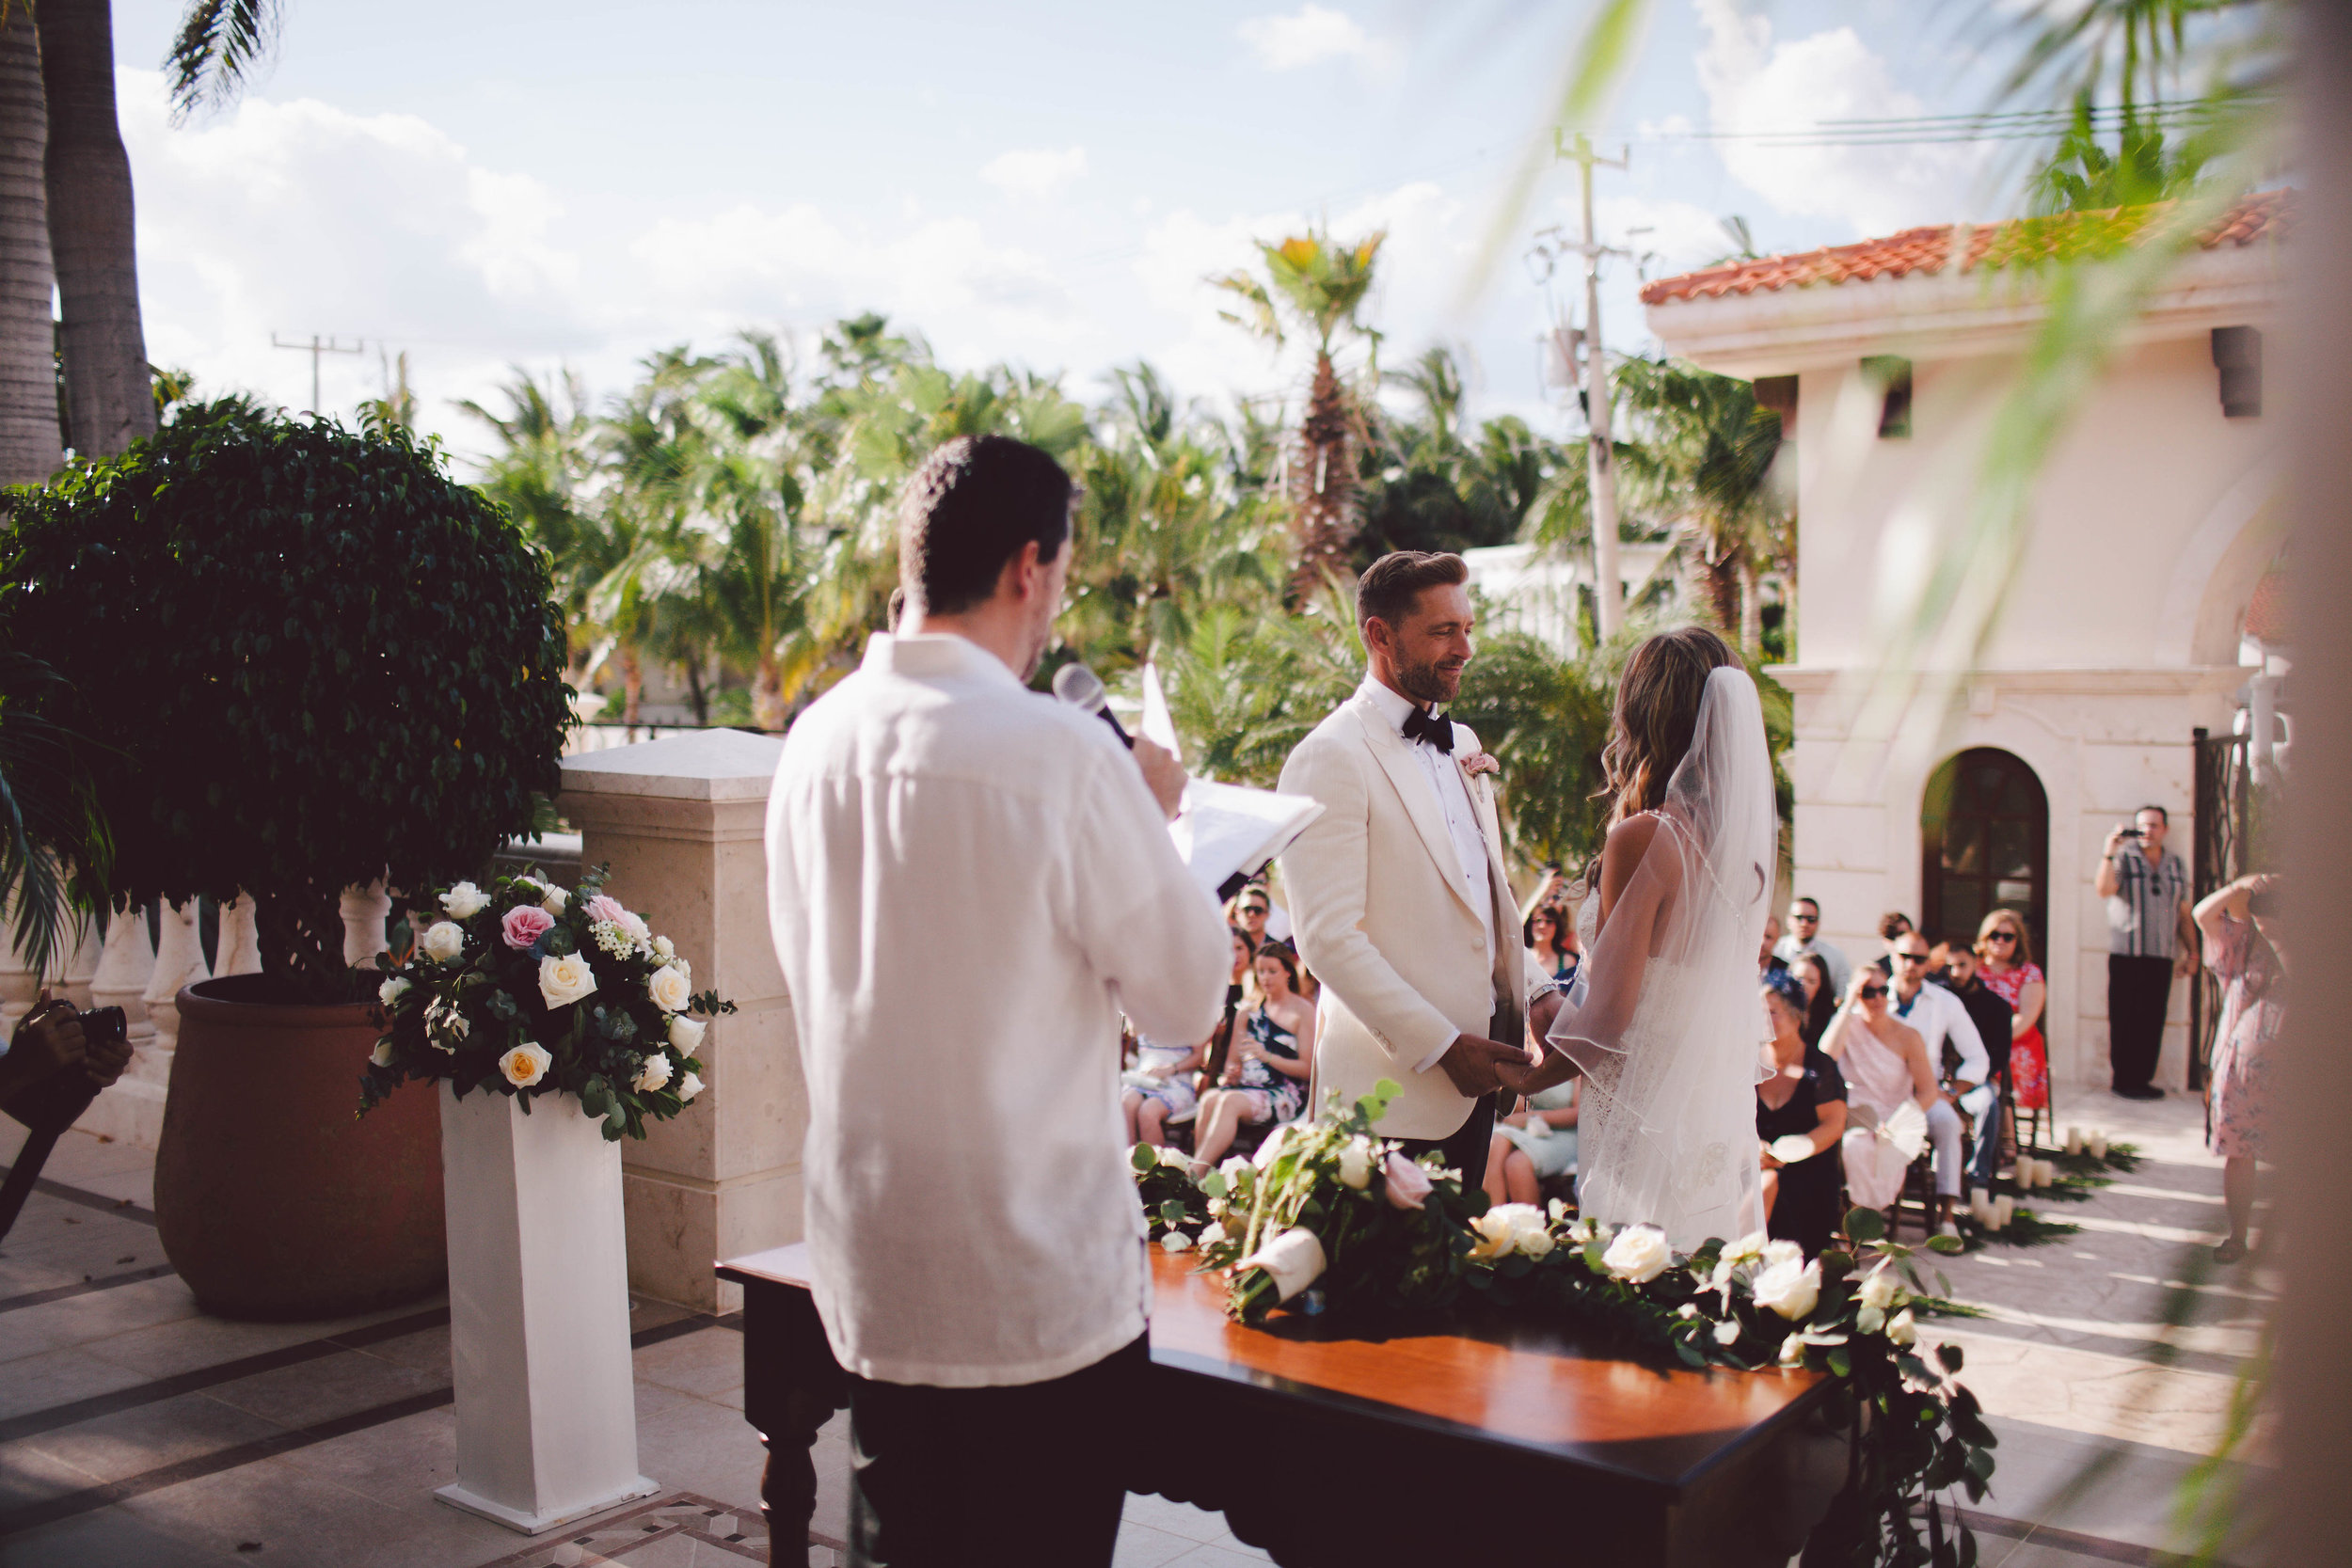 mexico_wedding_cancun_villa_la_joya_evangeline_lane_060.jpg